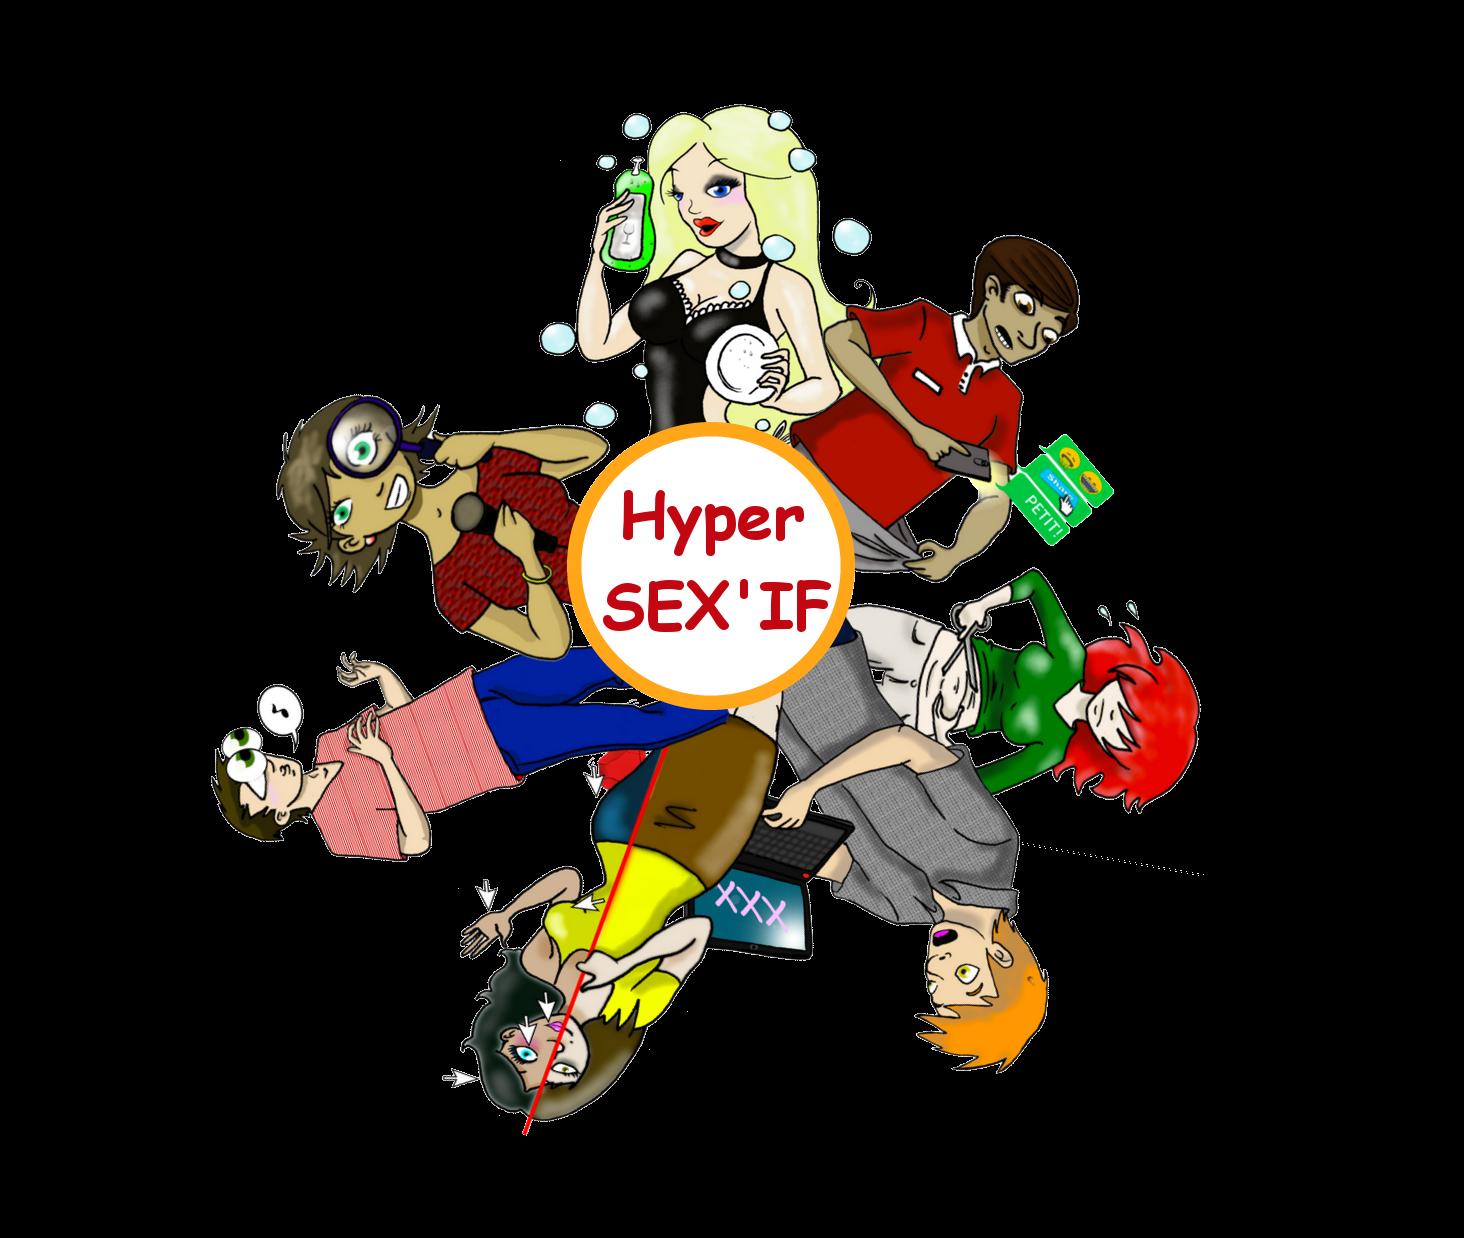 L hyper sexualisation